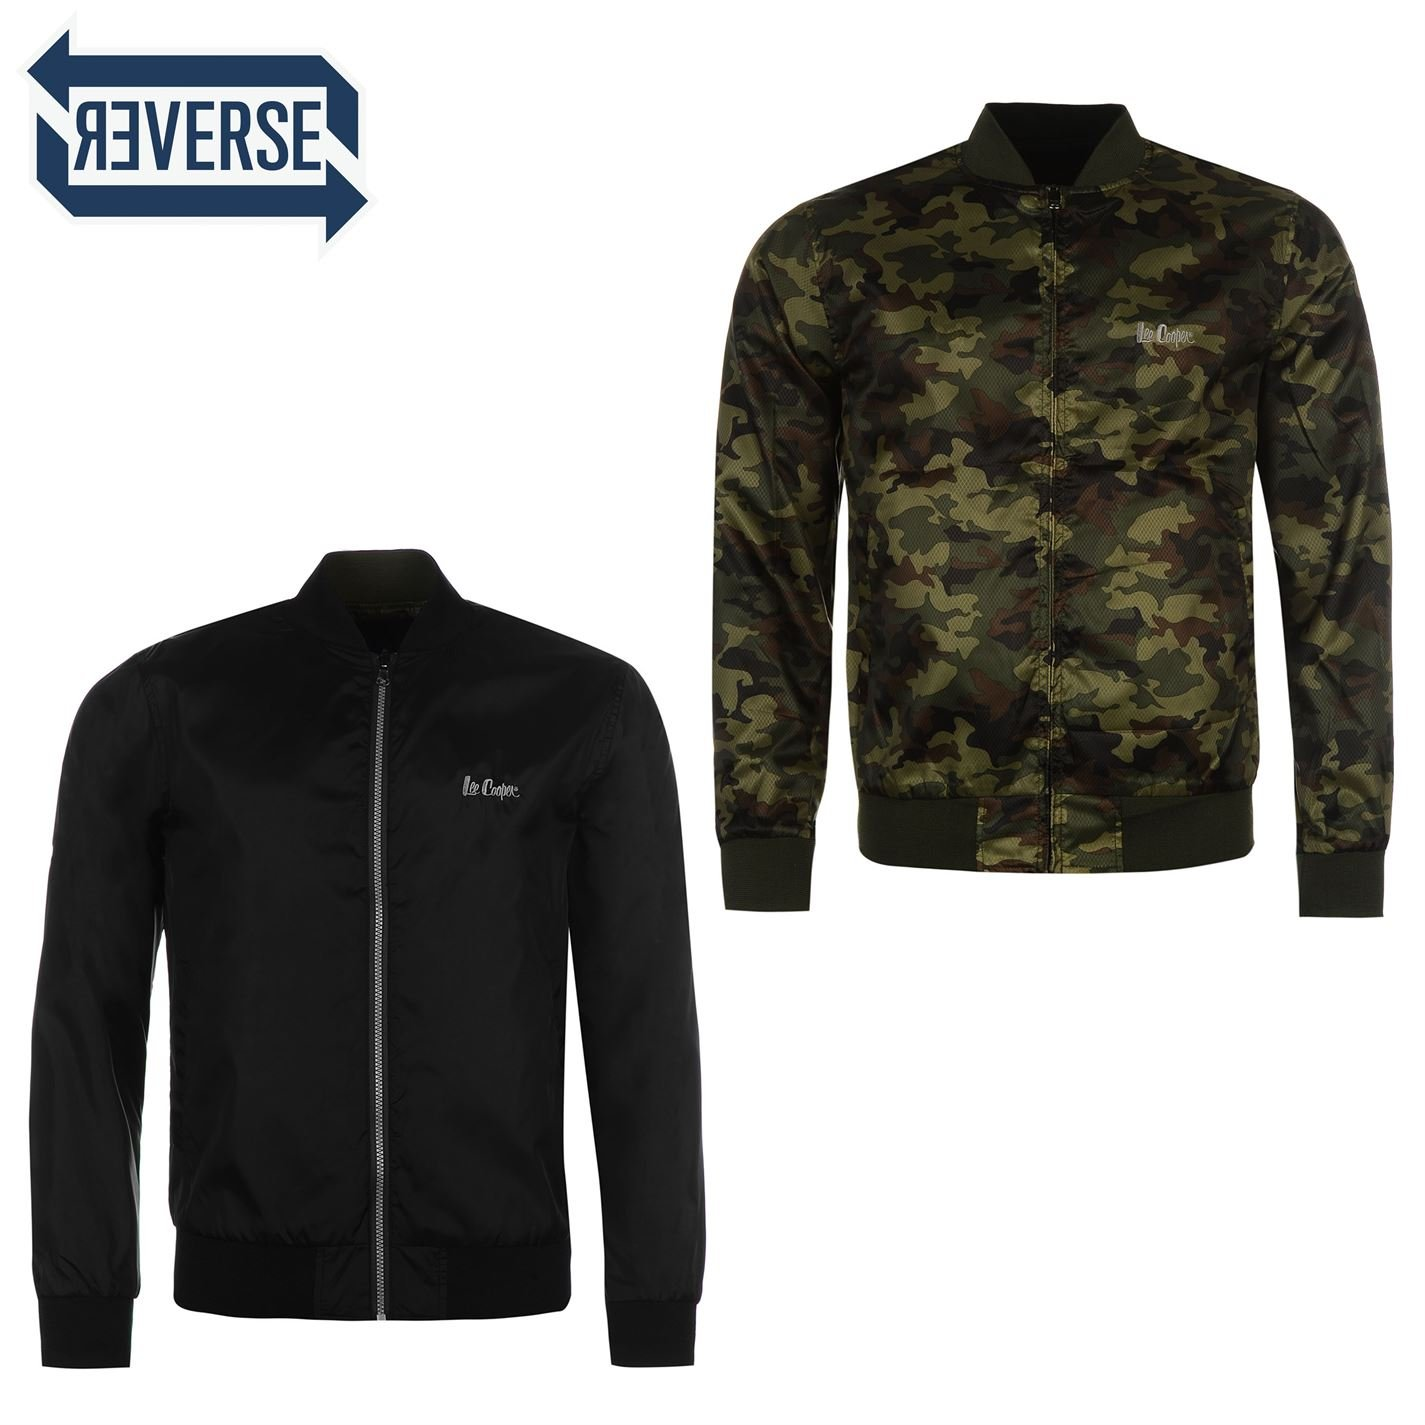 Lee Cooper Mens Reversible Jacket Rain Coat Top Zip Elasticated Trim Black/Camo Large